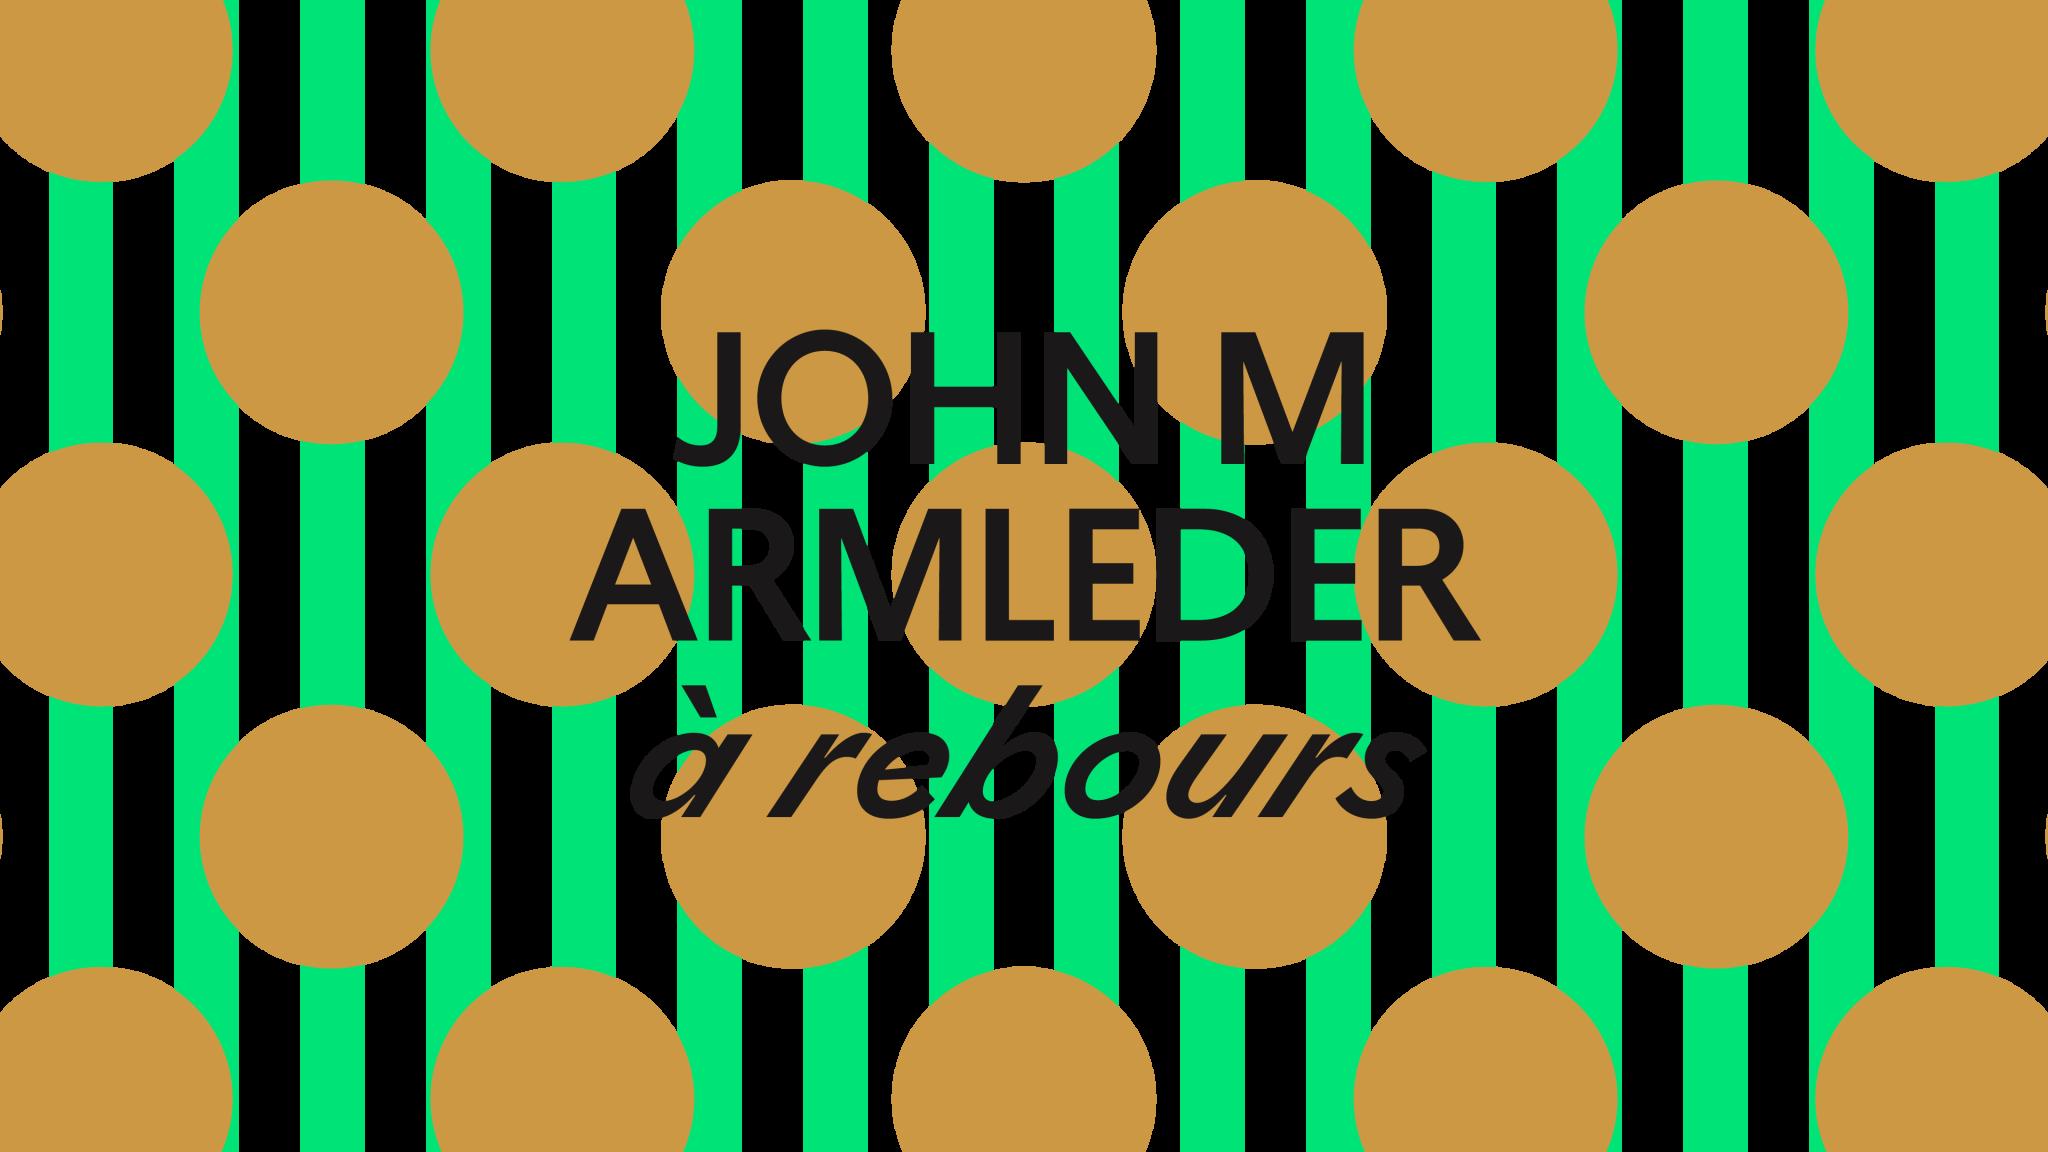 John_M_ARMLEDER_siteSDB salle2